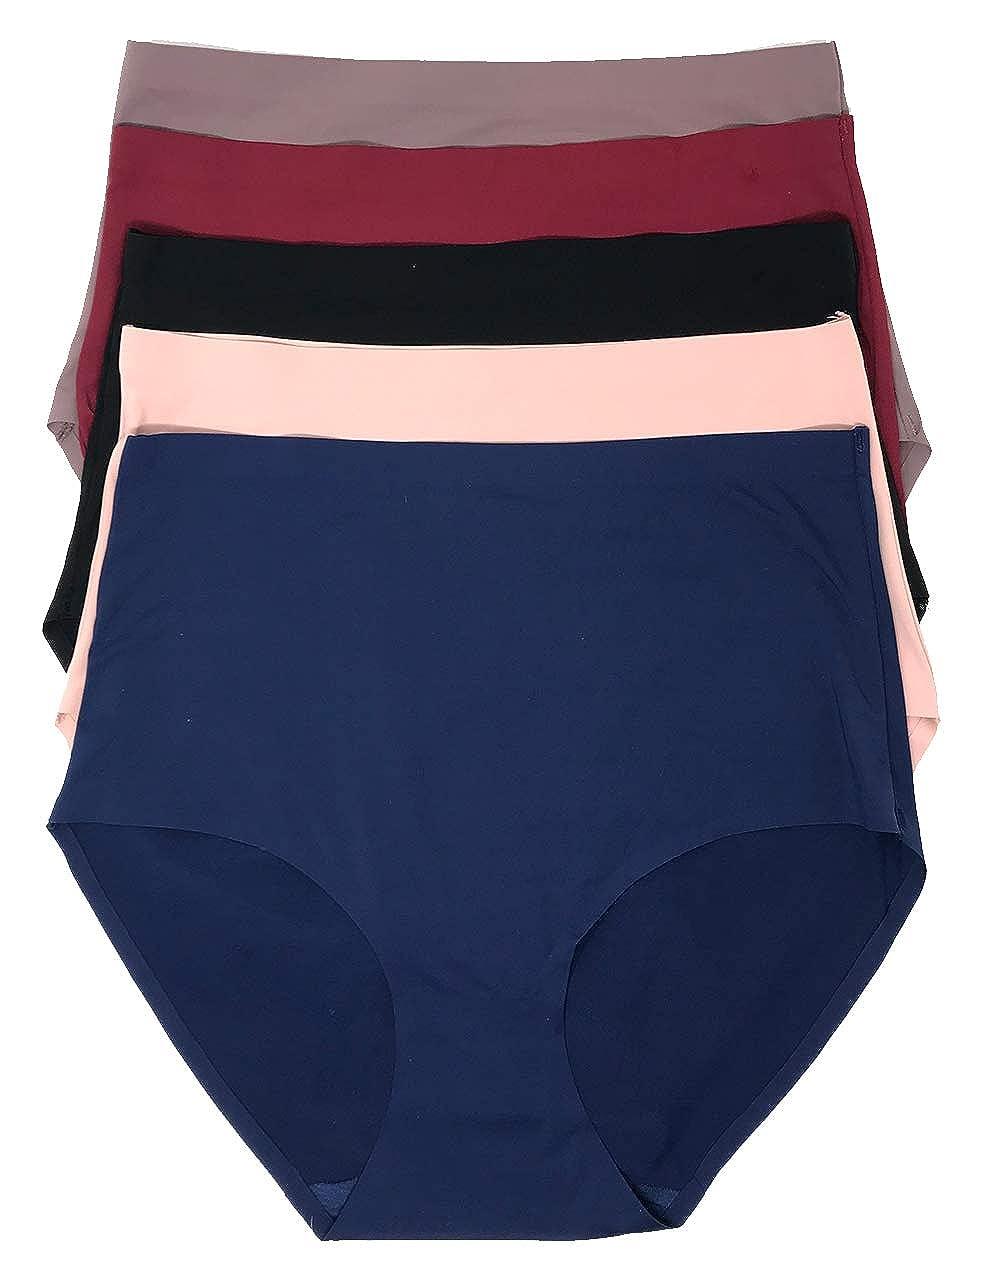 90893632abcb Laser Cut Cotton Panties